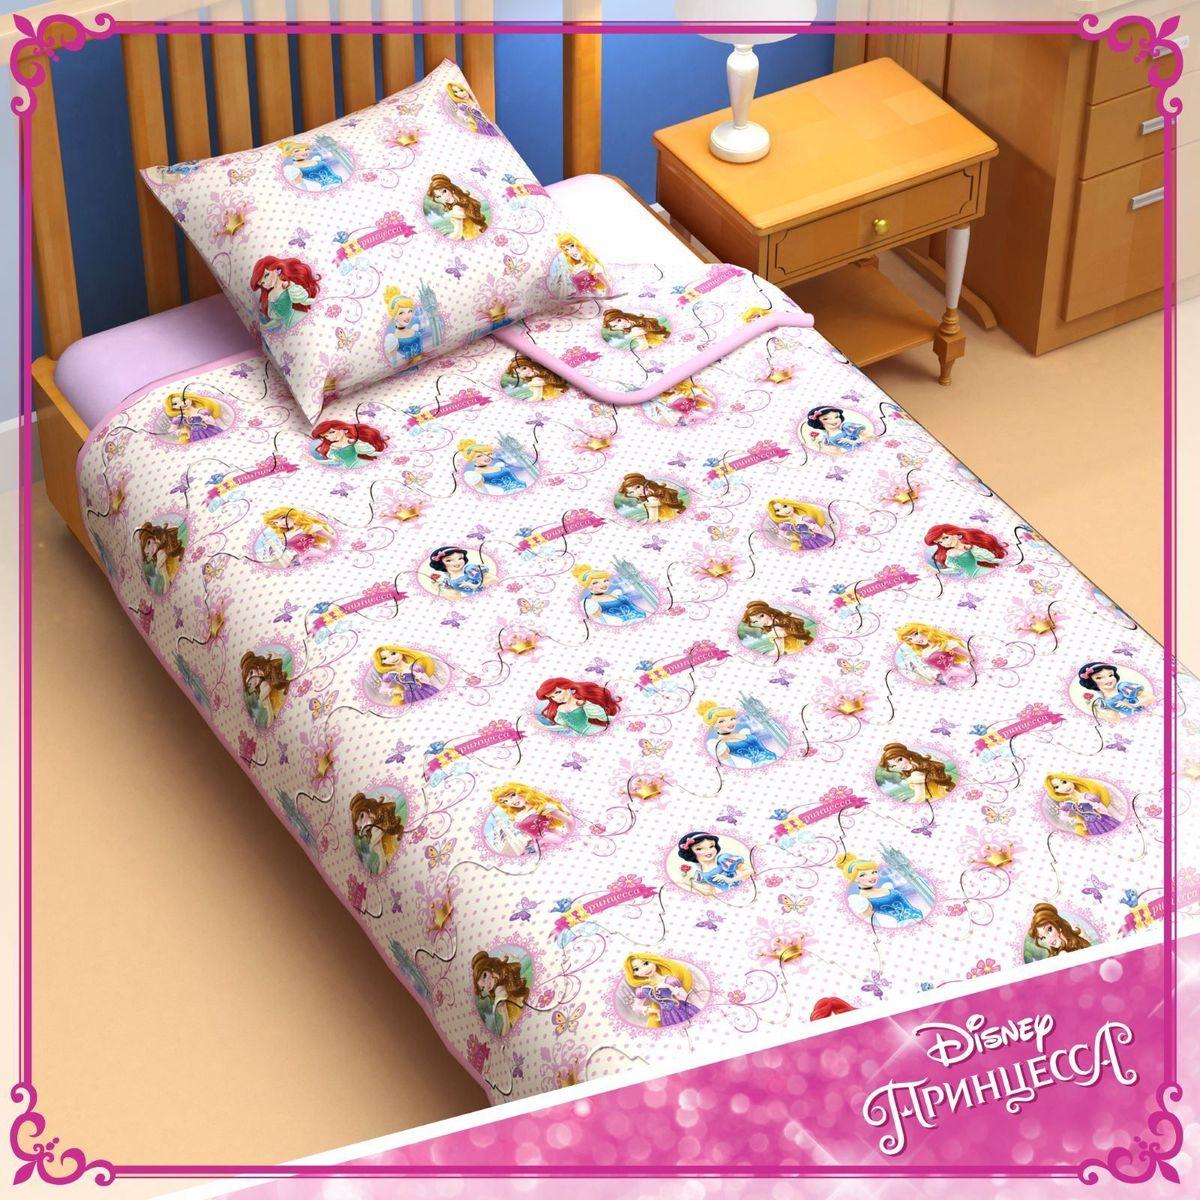 Disney Одеяло 1,5 спальное Принцессы 140 х 205 см 1153168